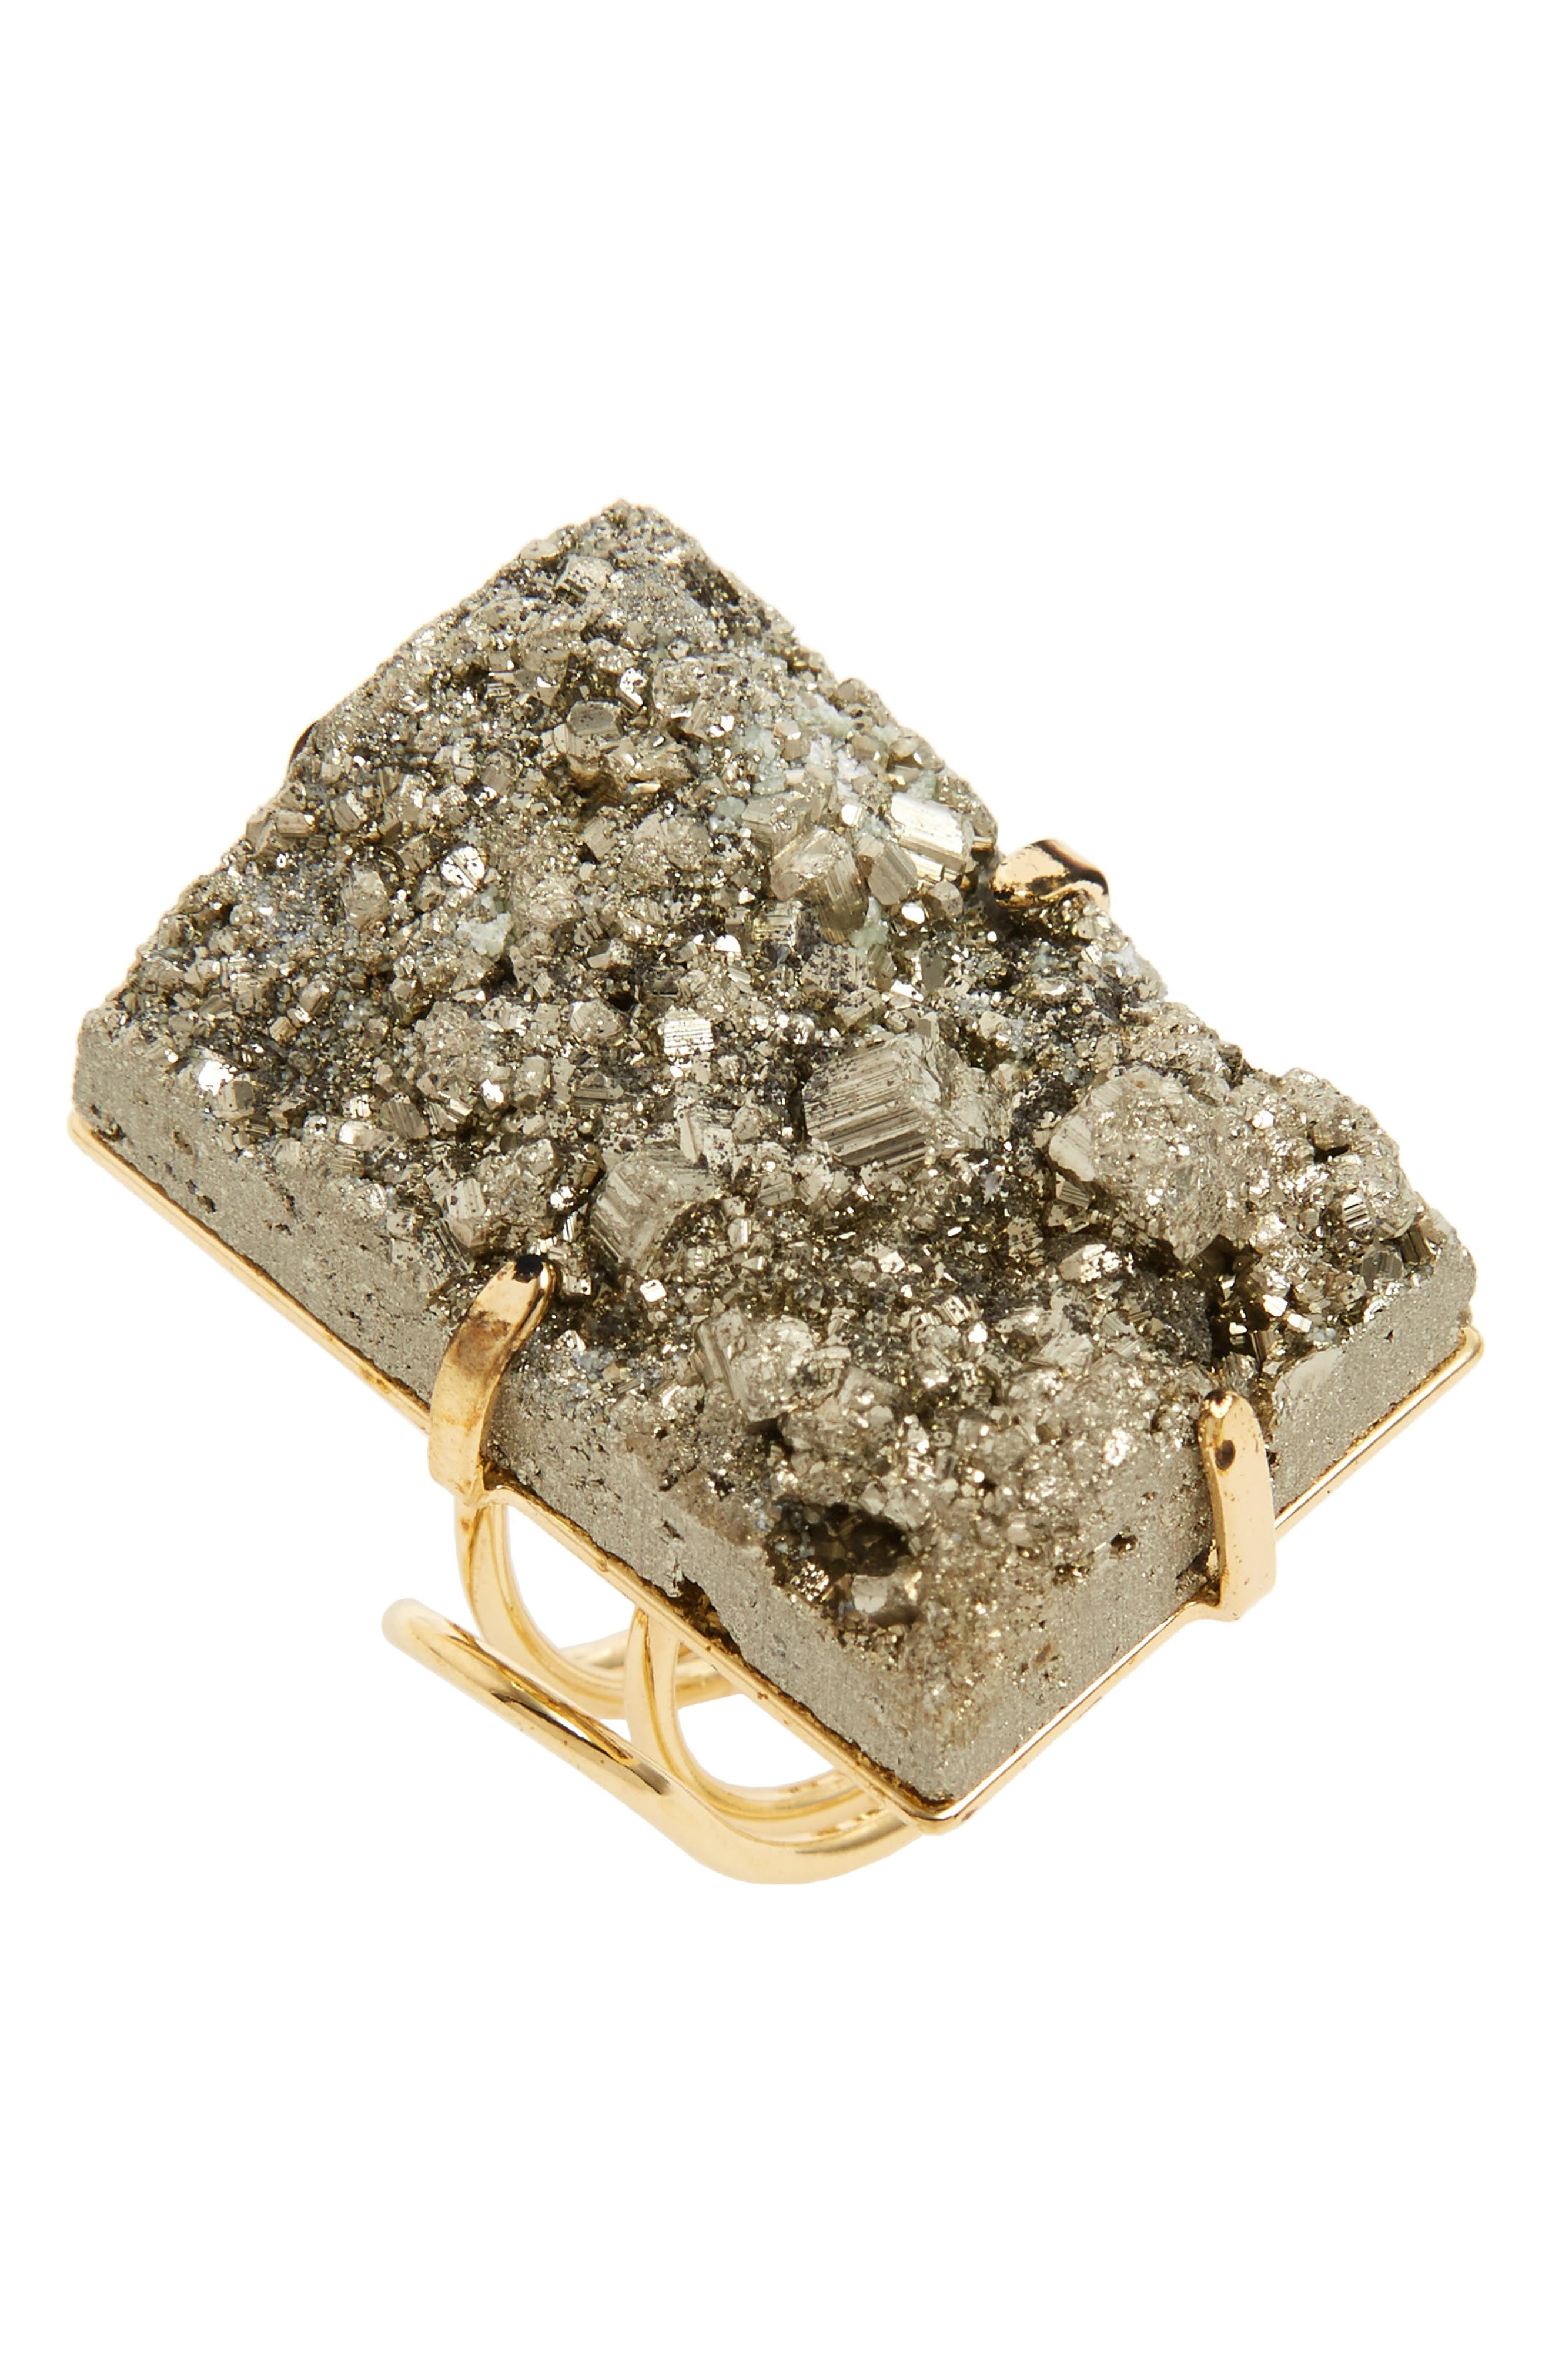 Main Image - Nakamol Design Rectangular Pyrite Ring